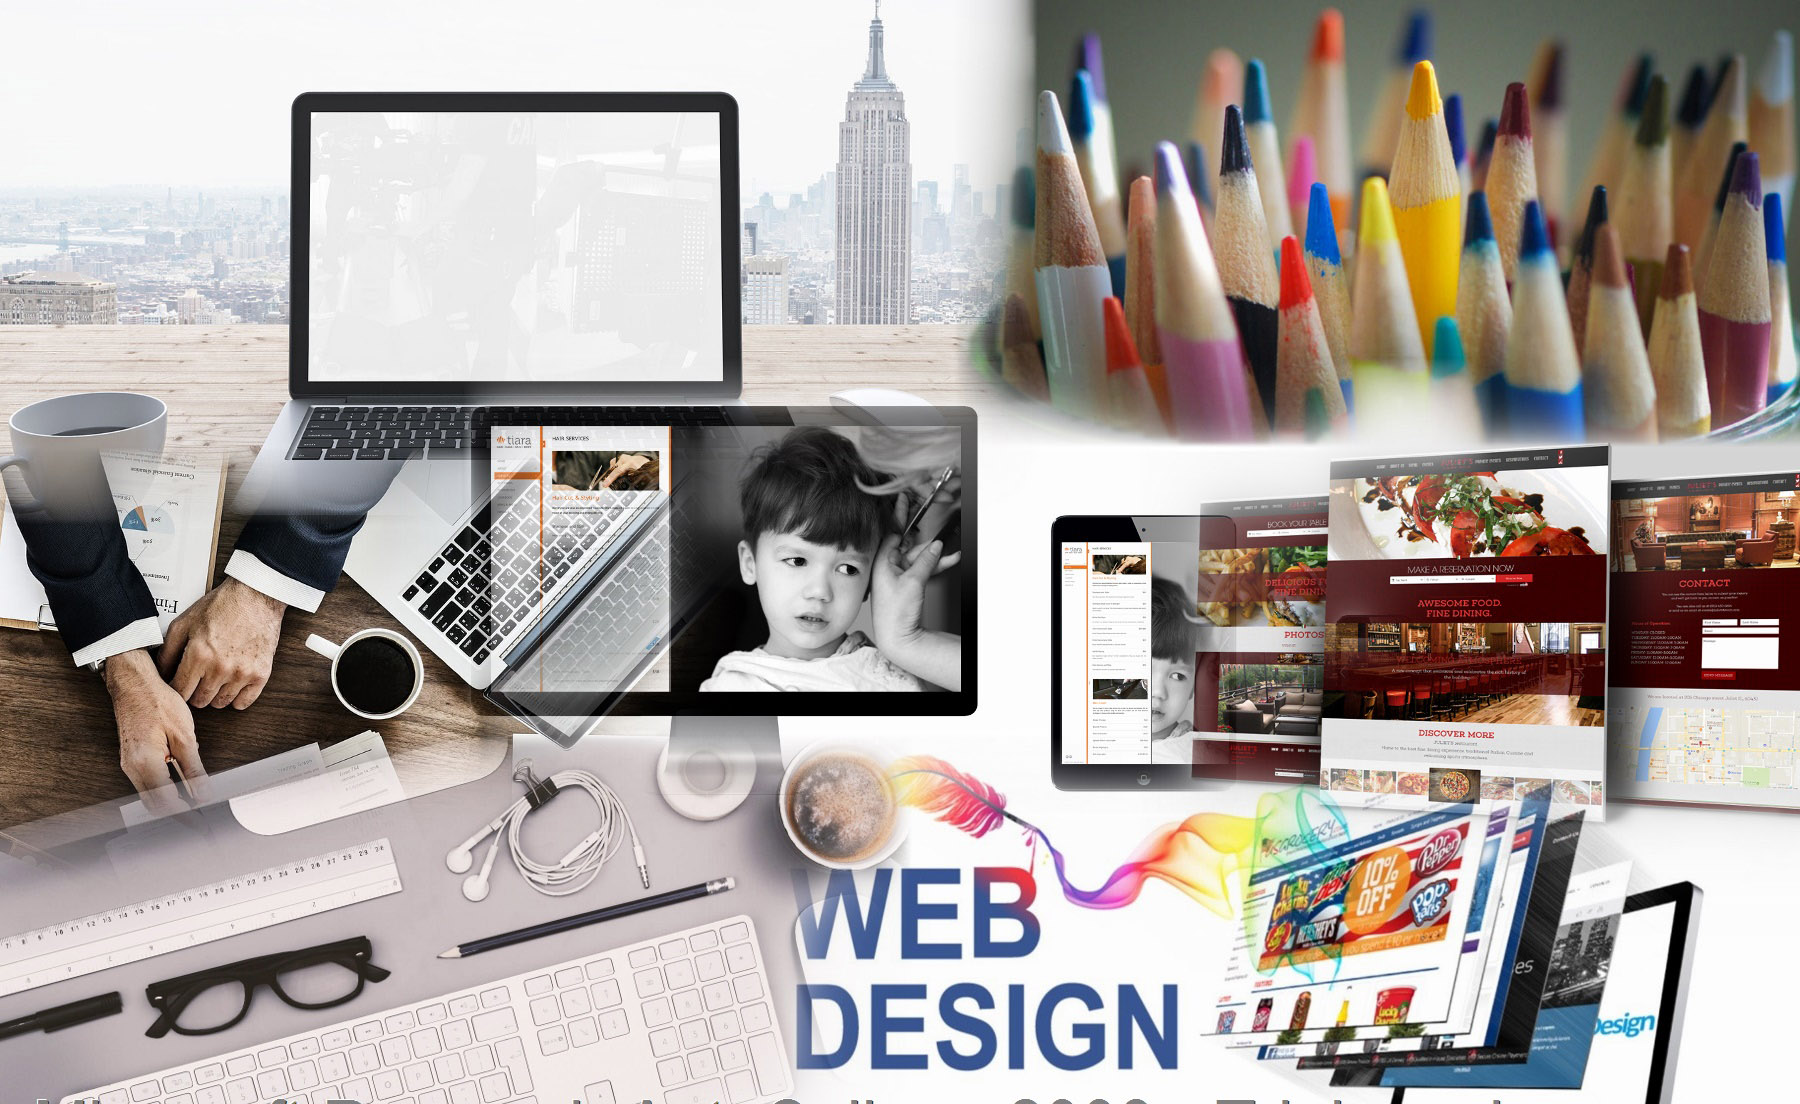 Alexahm WebDesign siti internet e SEO